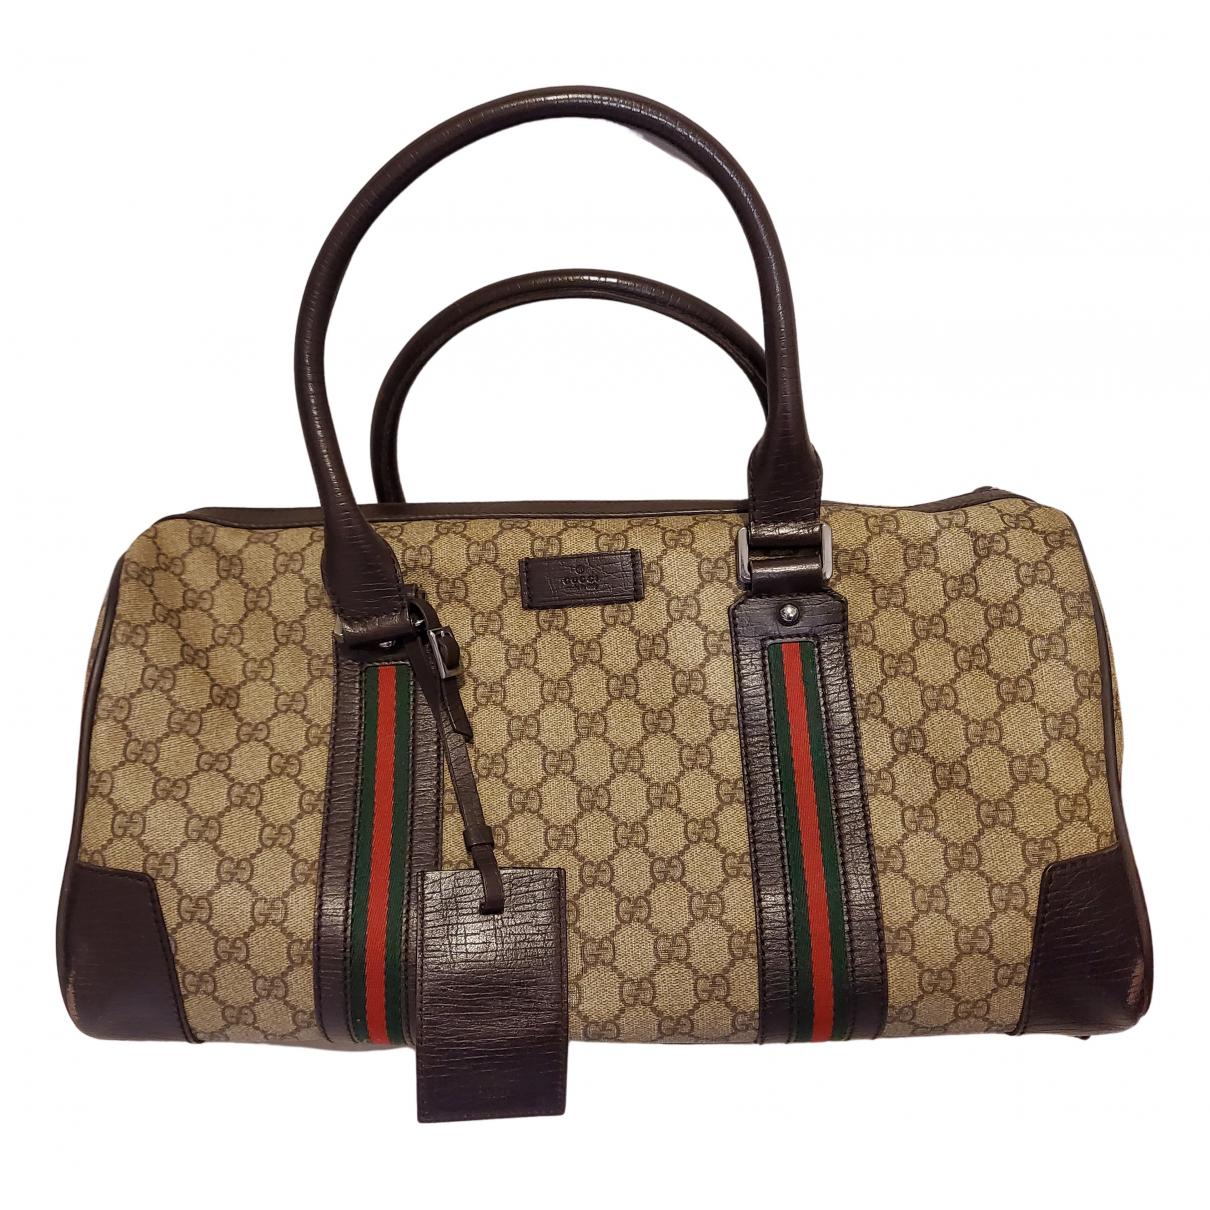 Gucci N Multicolour Cloth handbag for Women N